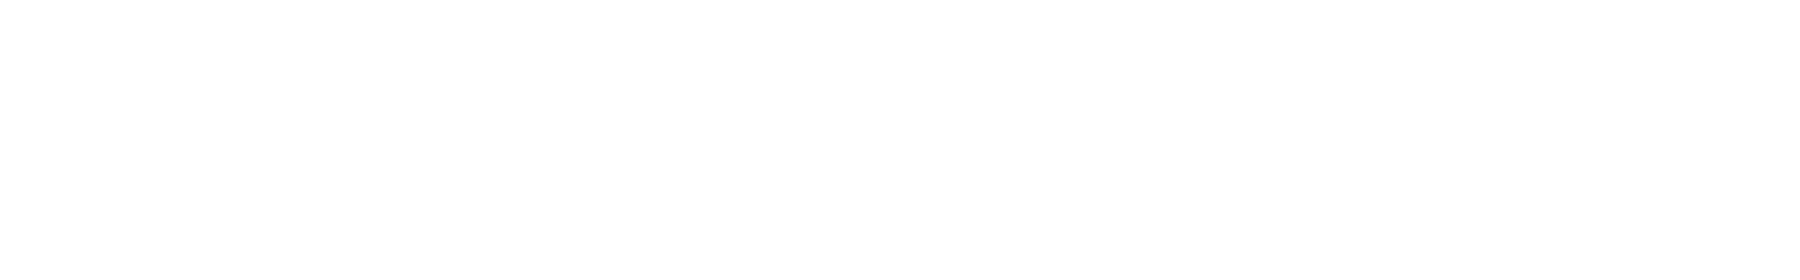 synth choir bm6